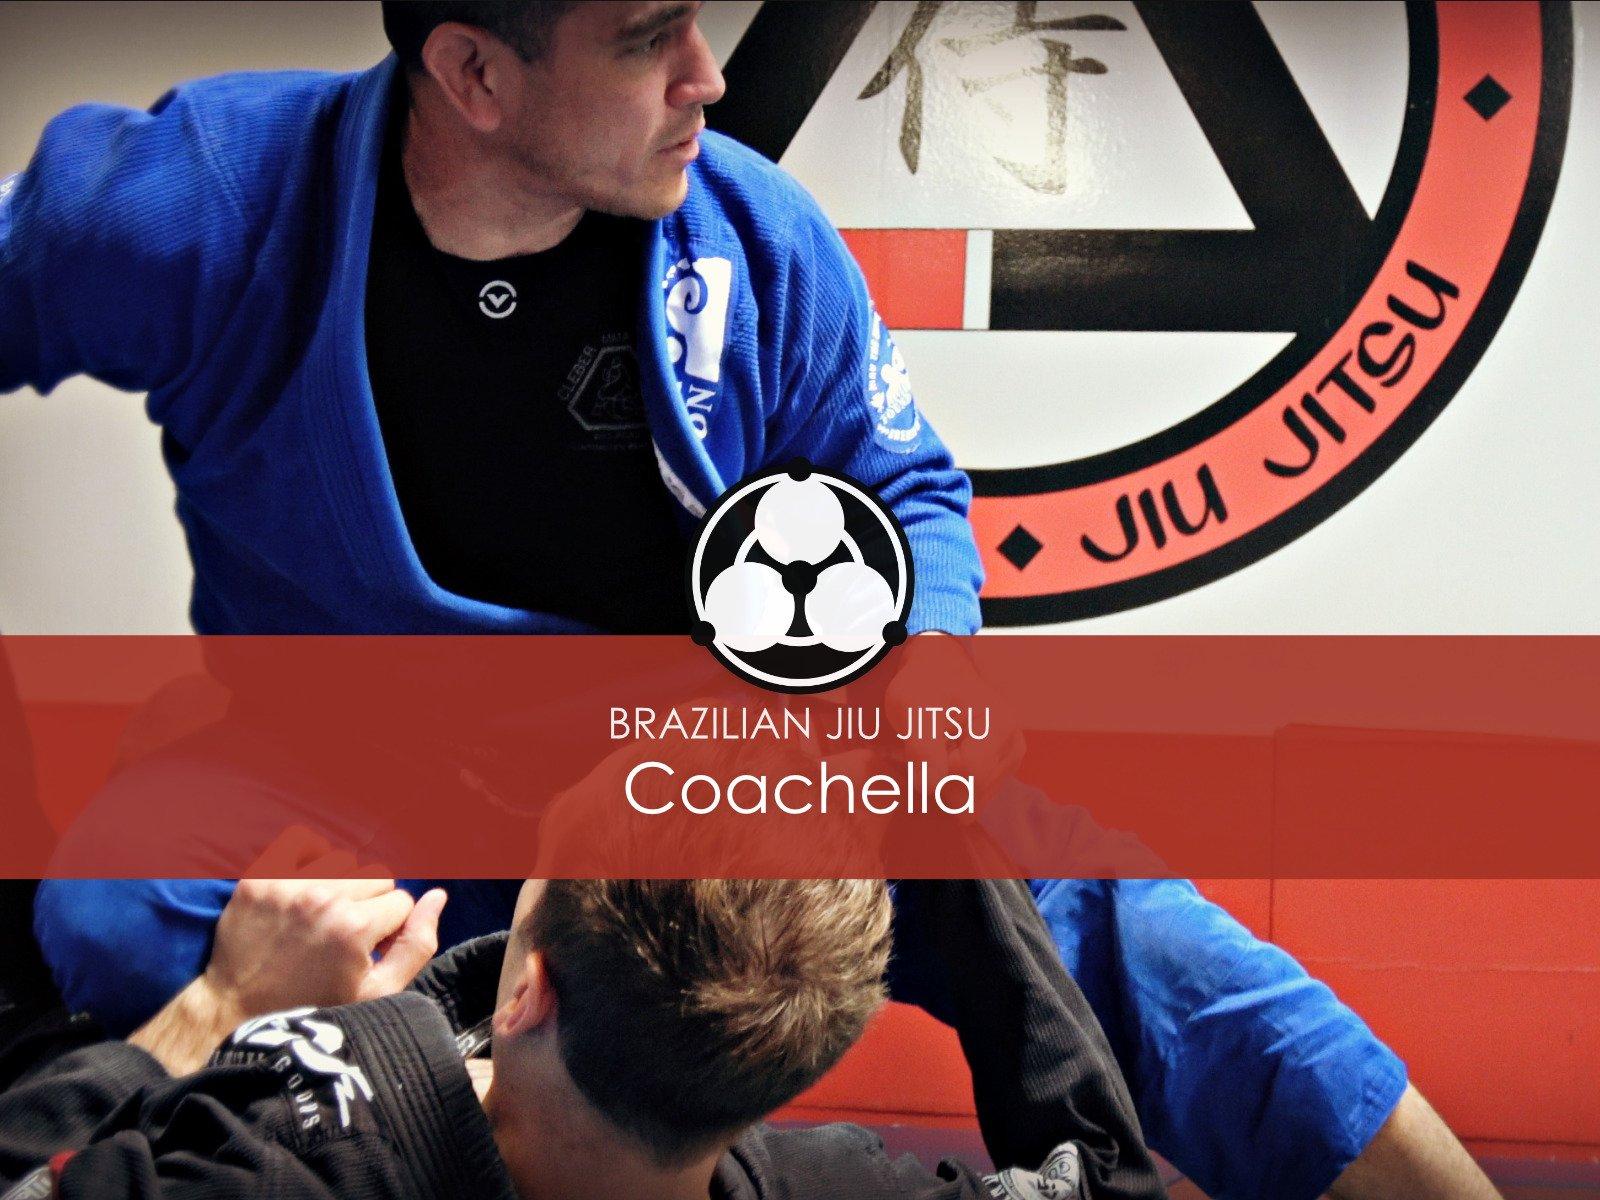 Brazilian Jiu Jitsu: Coachella - Season 1